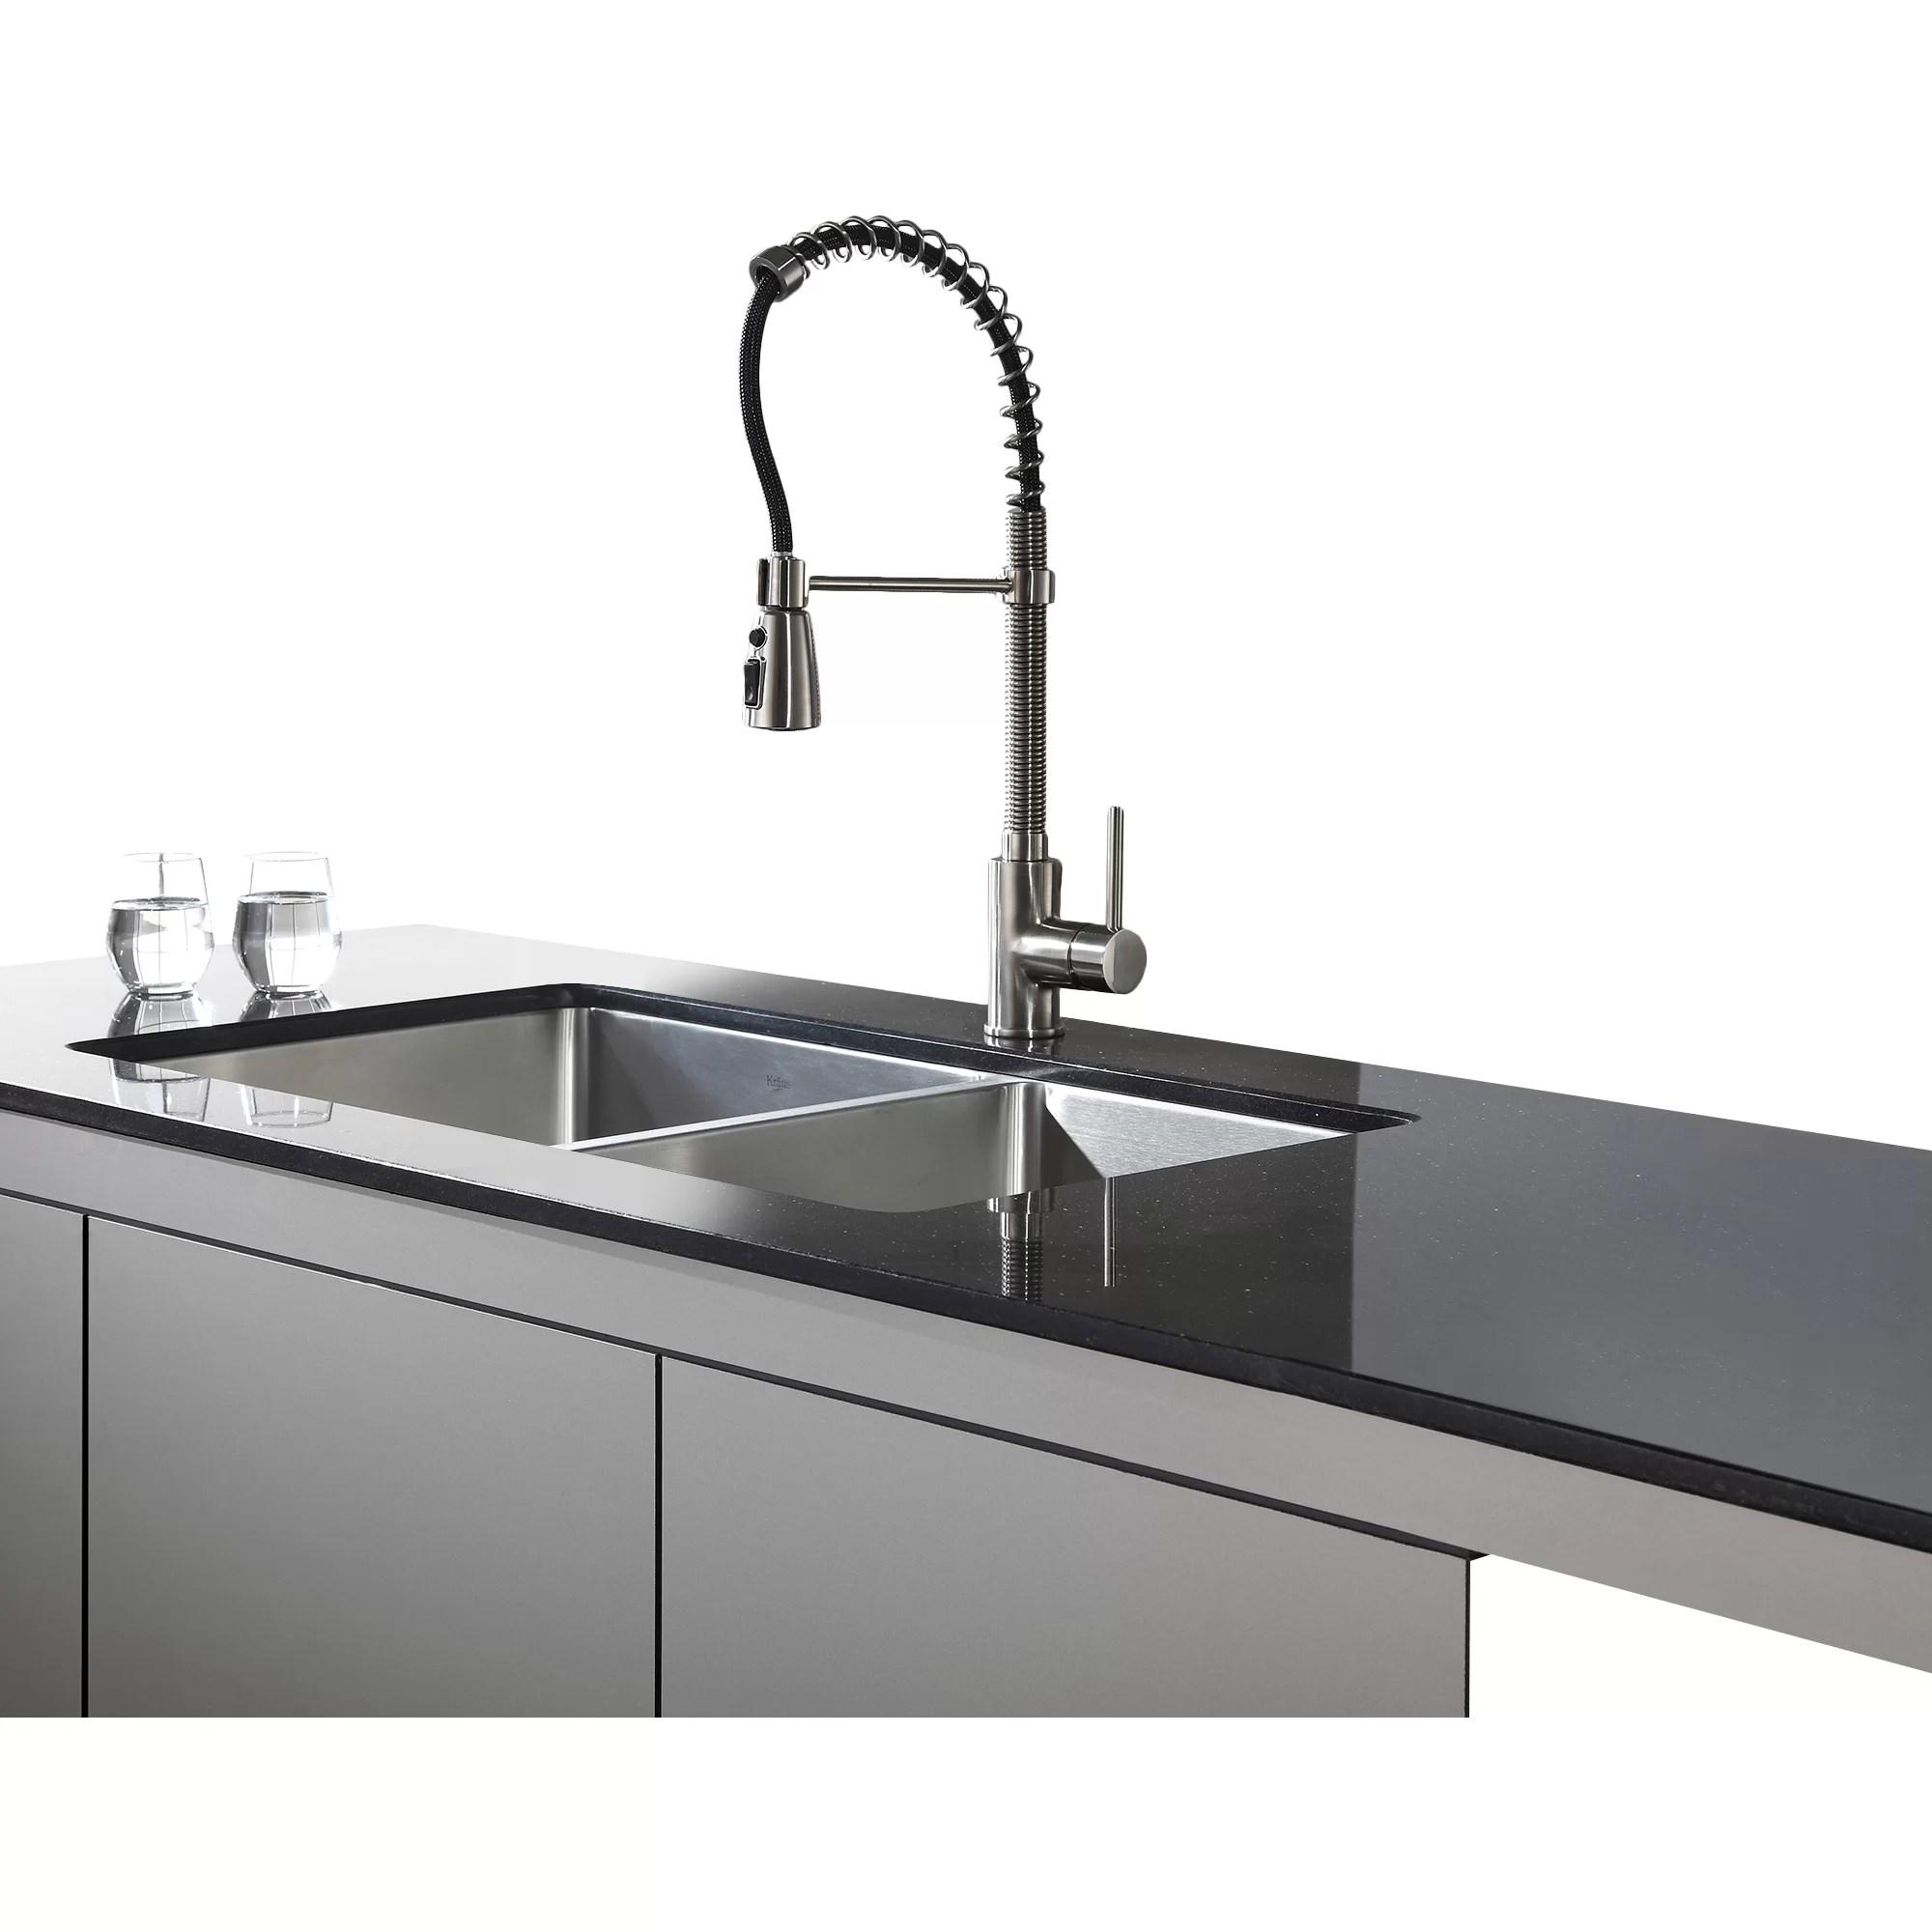 undermount double kitchen sink wall tile kraus 32 75 quot x 19 6 piece bowl